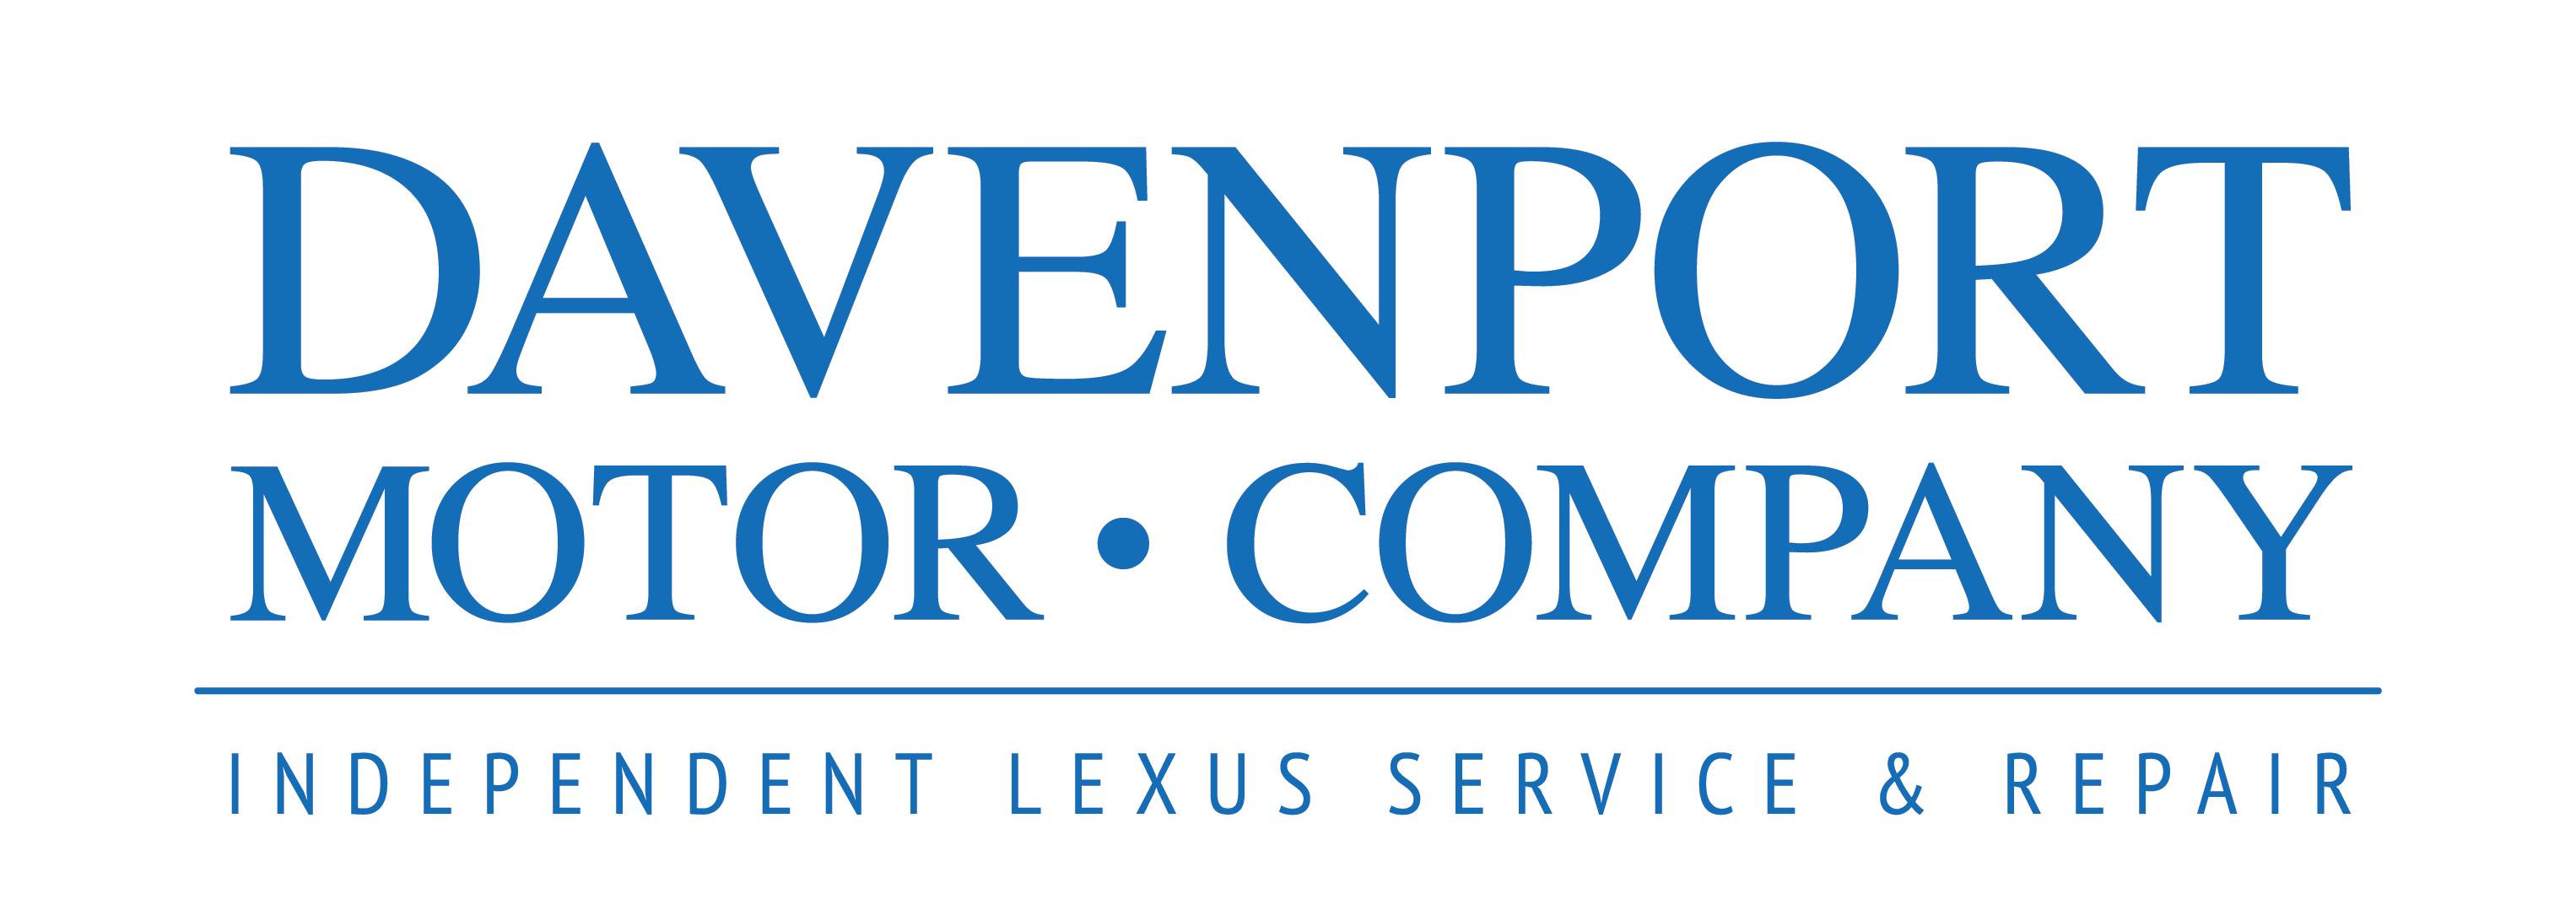 Davenport Motor Company